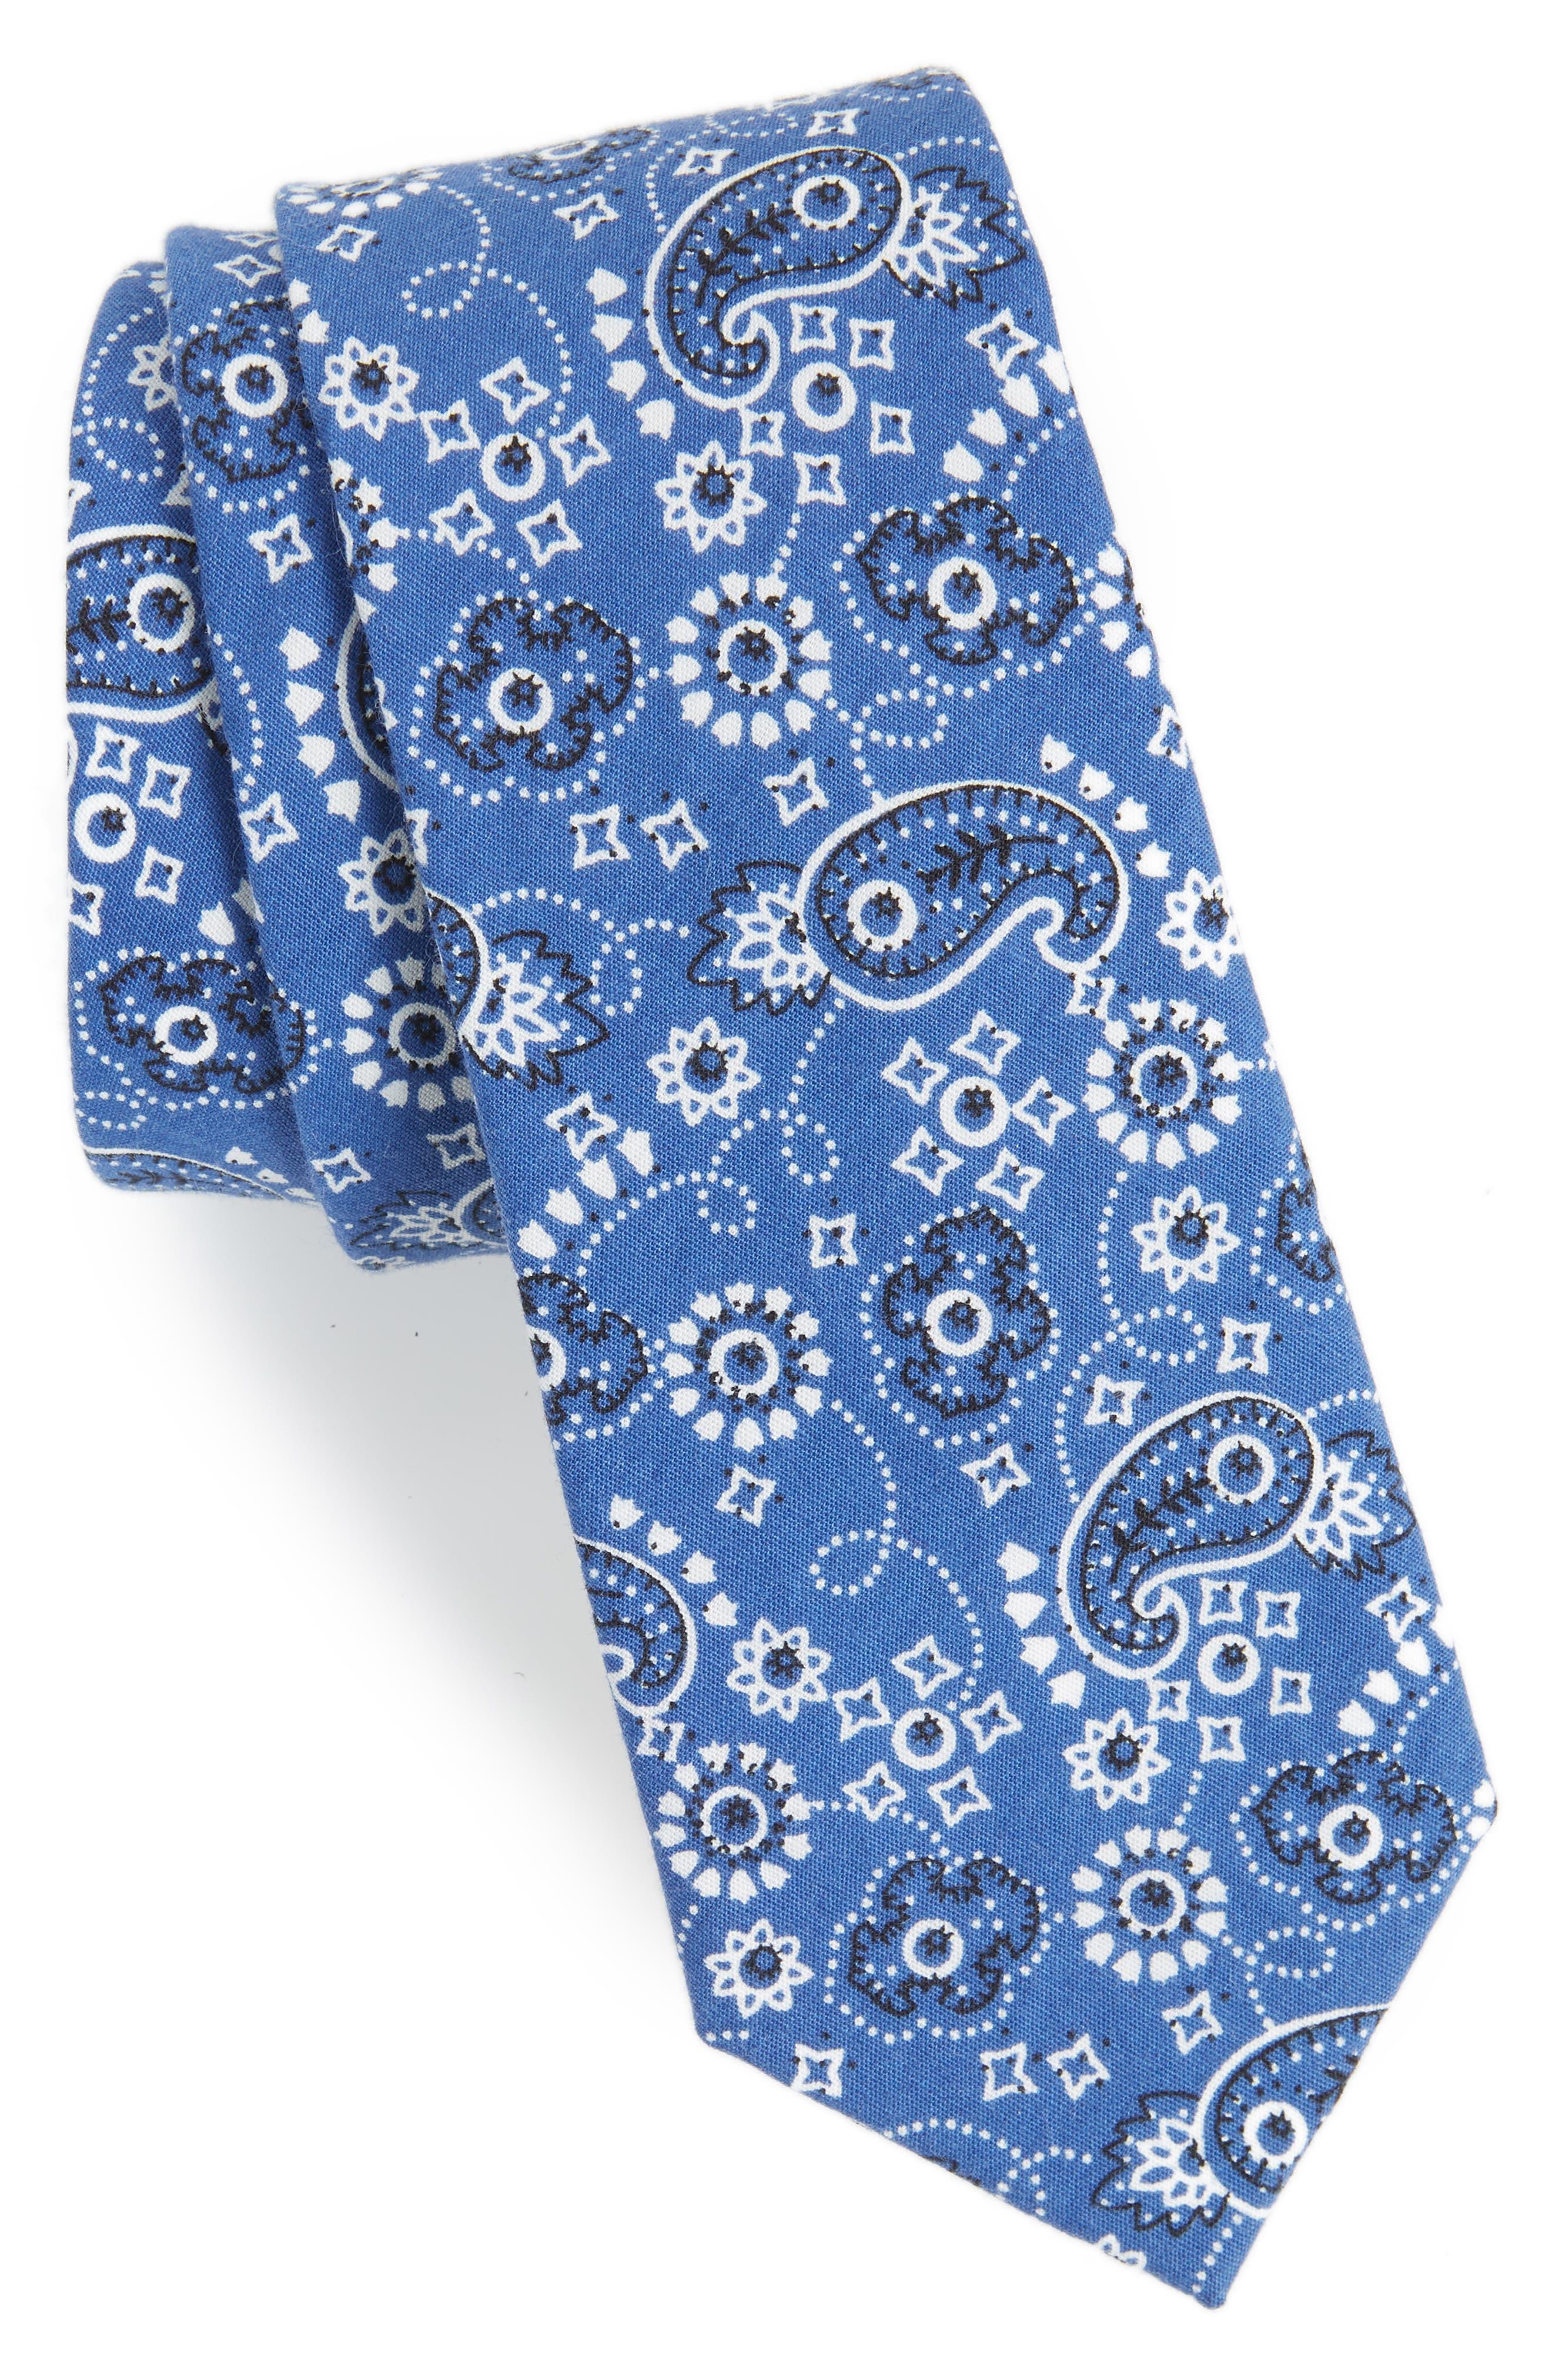 Orduna Paisley Cotton Tie,                             Main thumbnail 1, color,                             NAVY